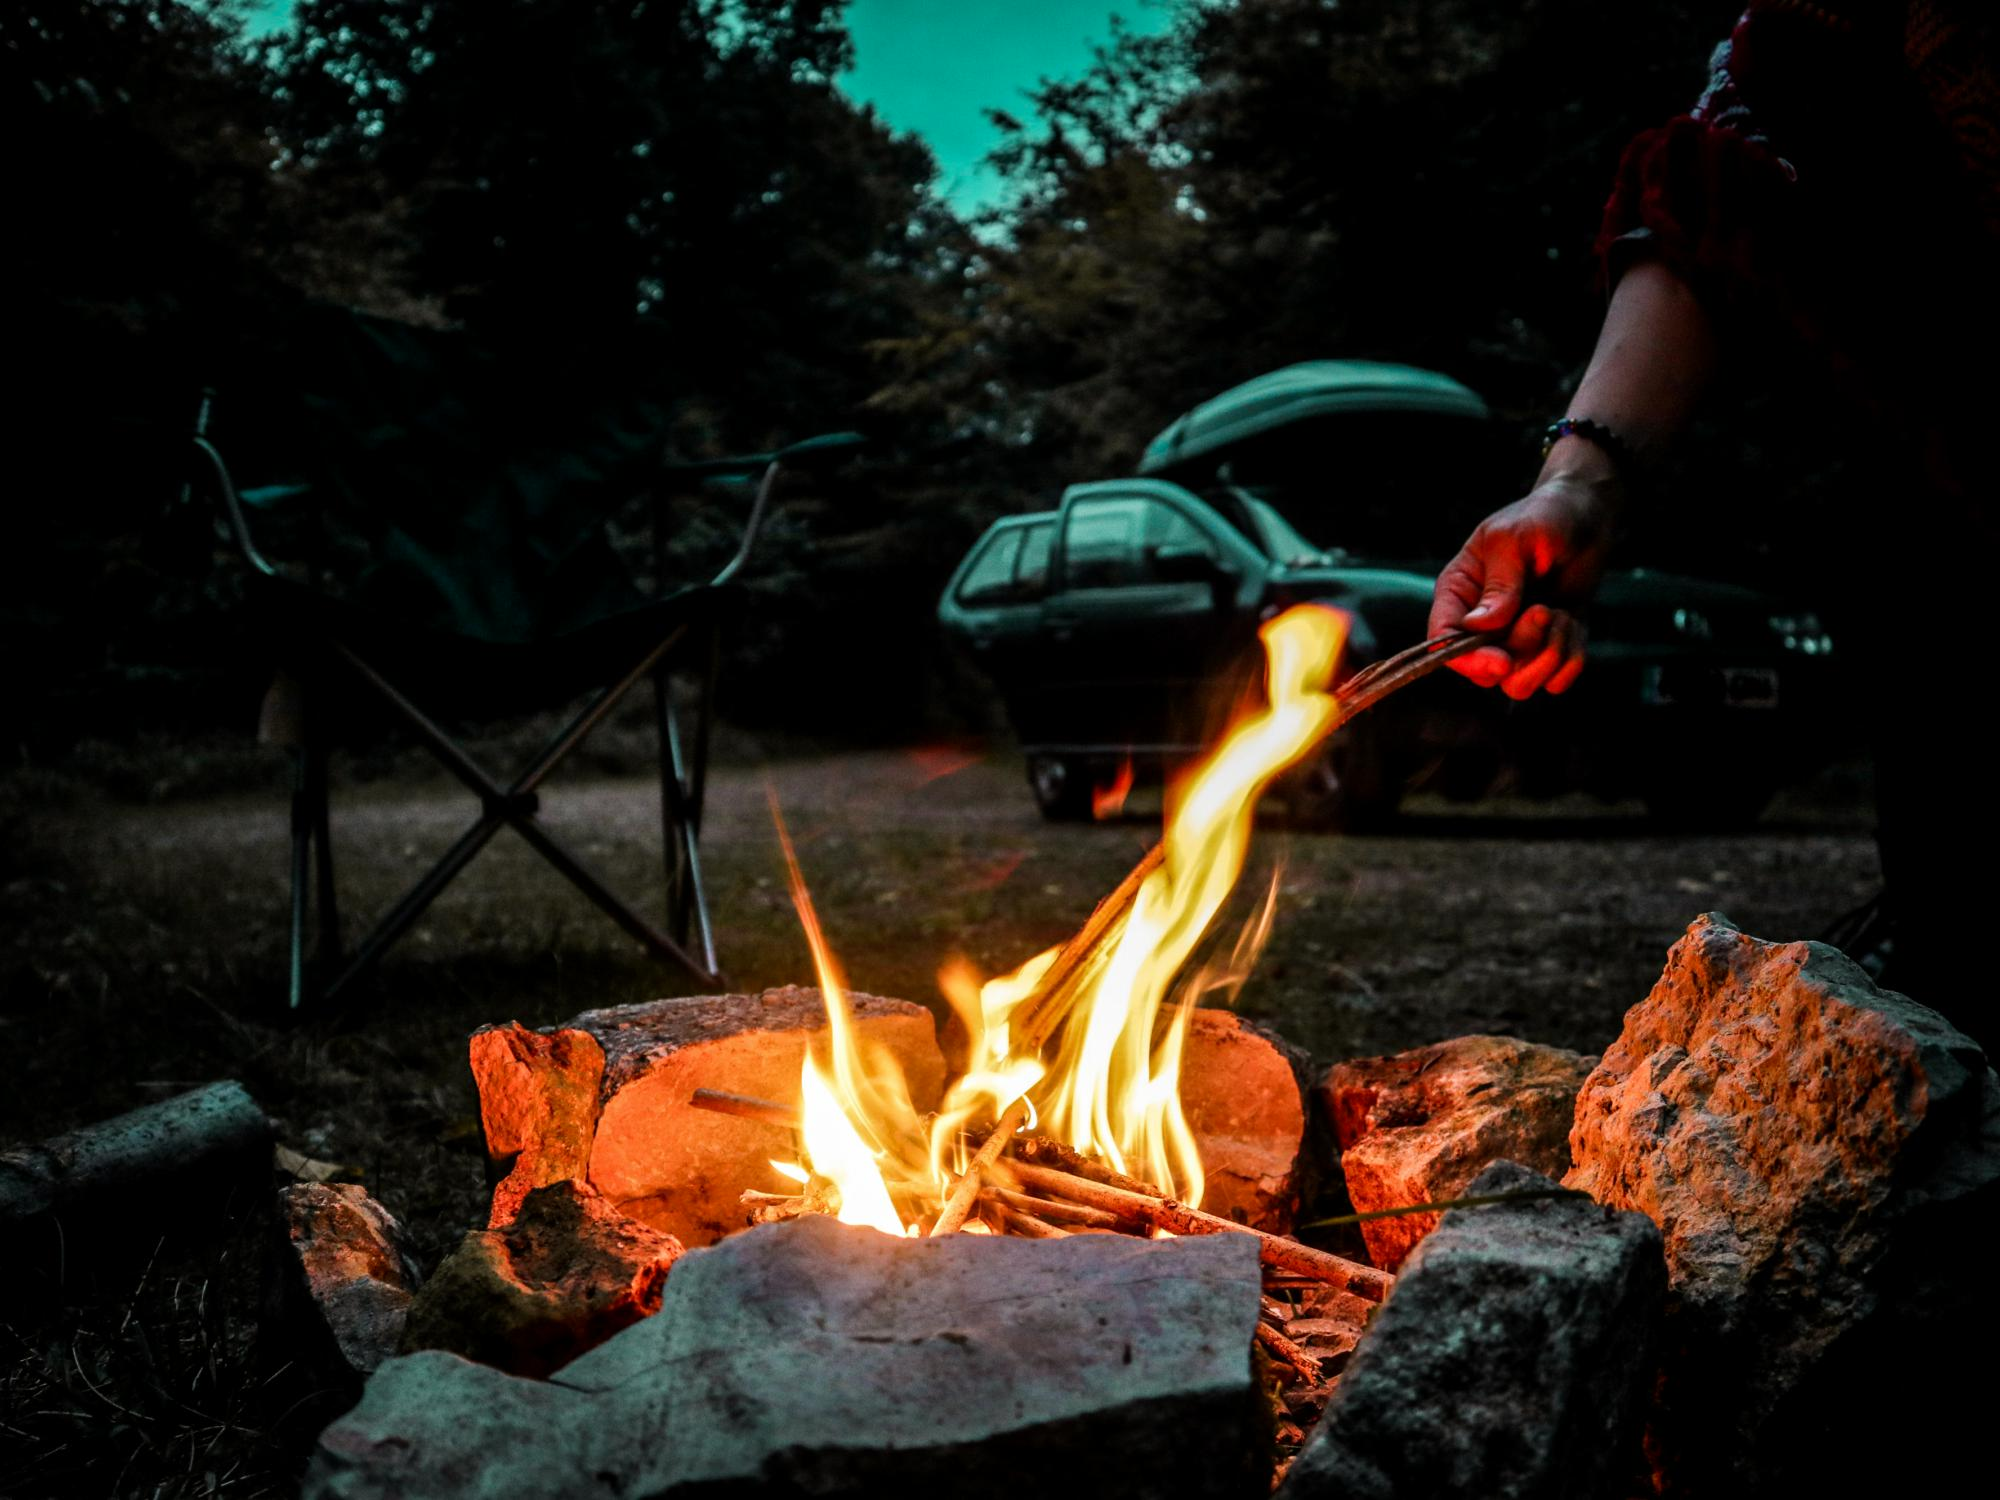 Campsites in East Anglia – I Love This Campsite